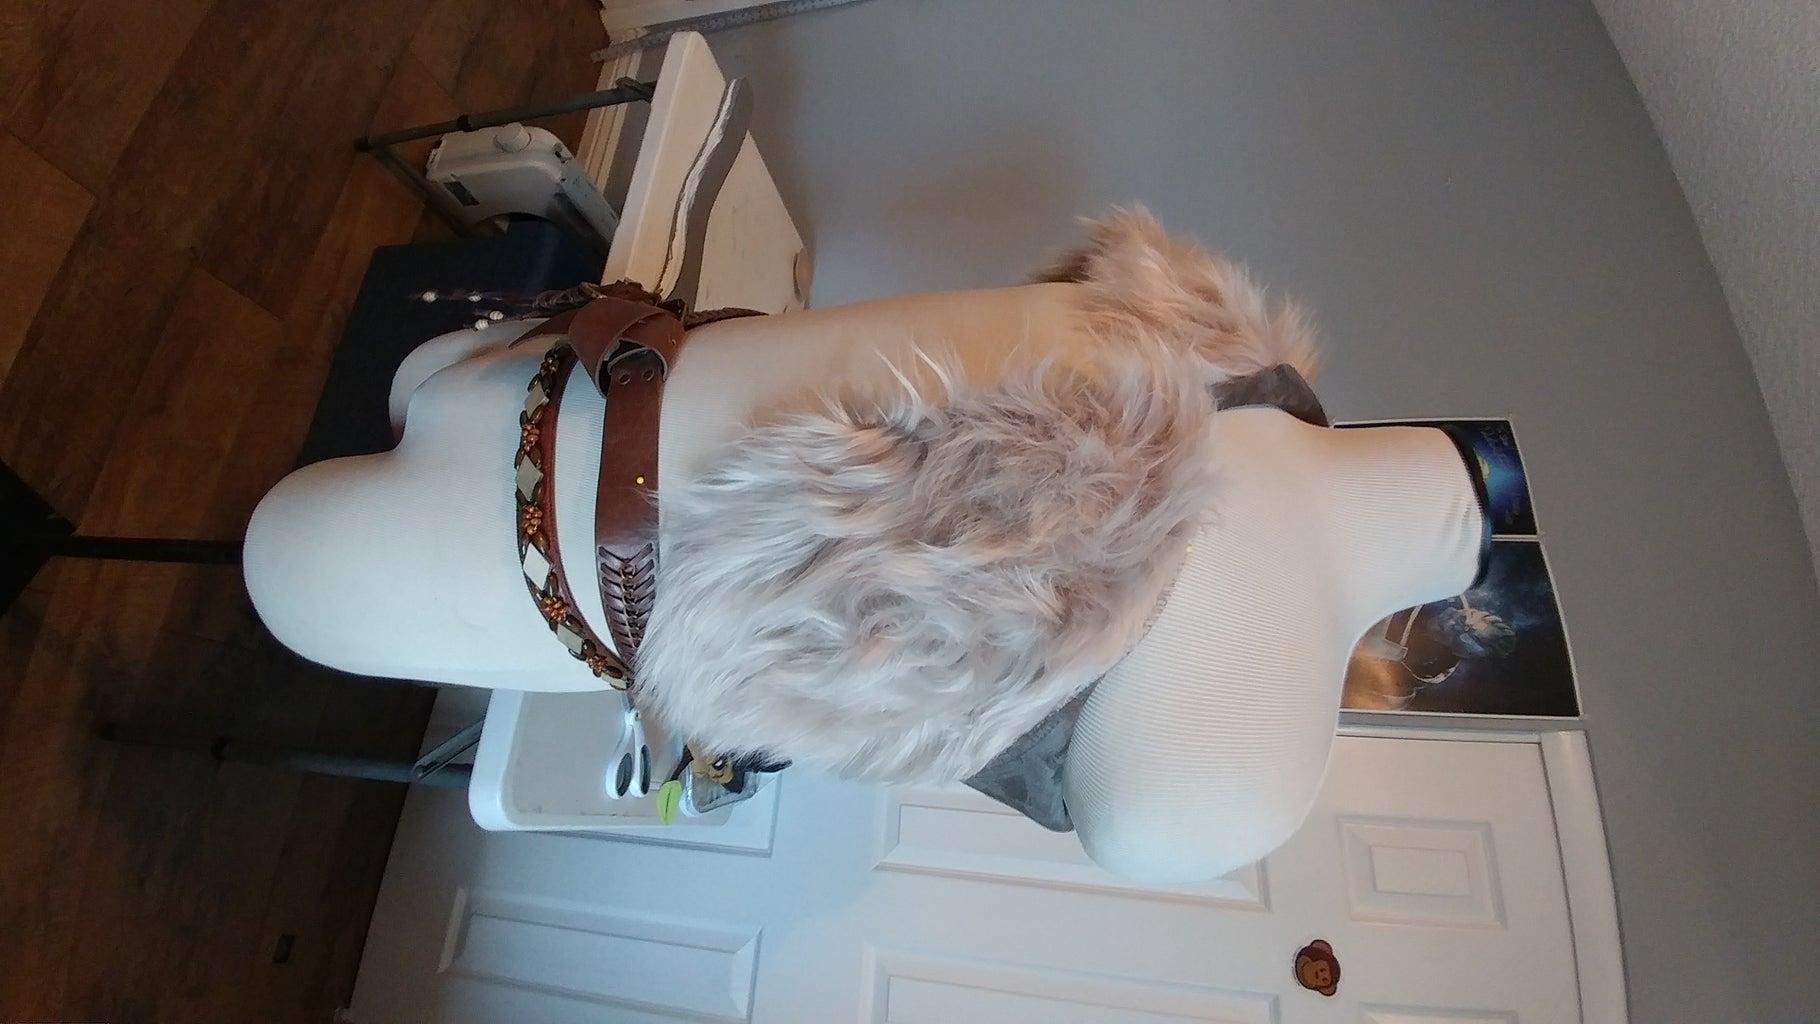 Fur and Pauldron